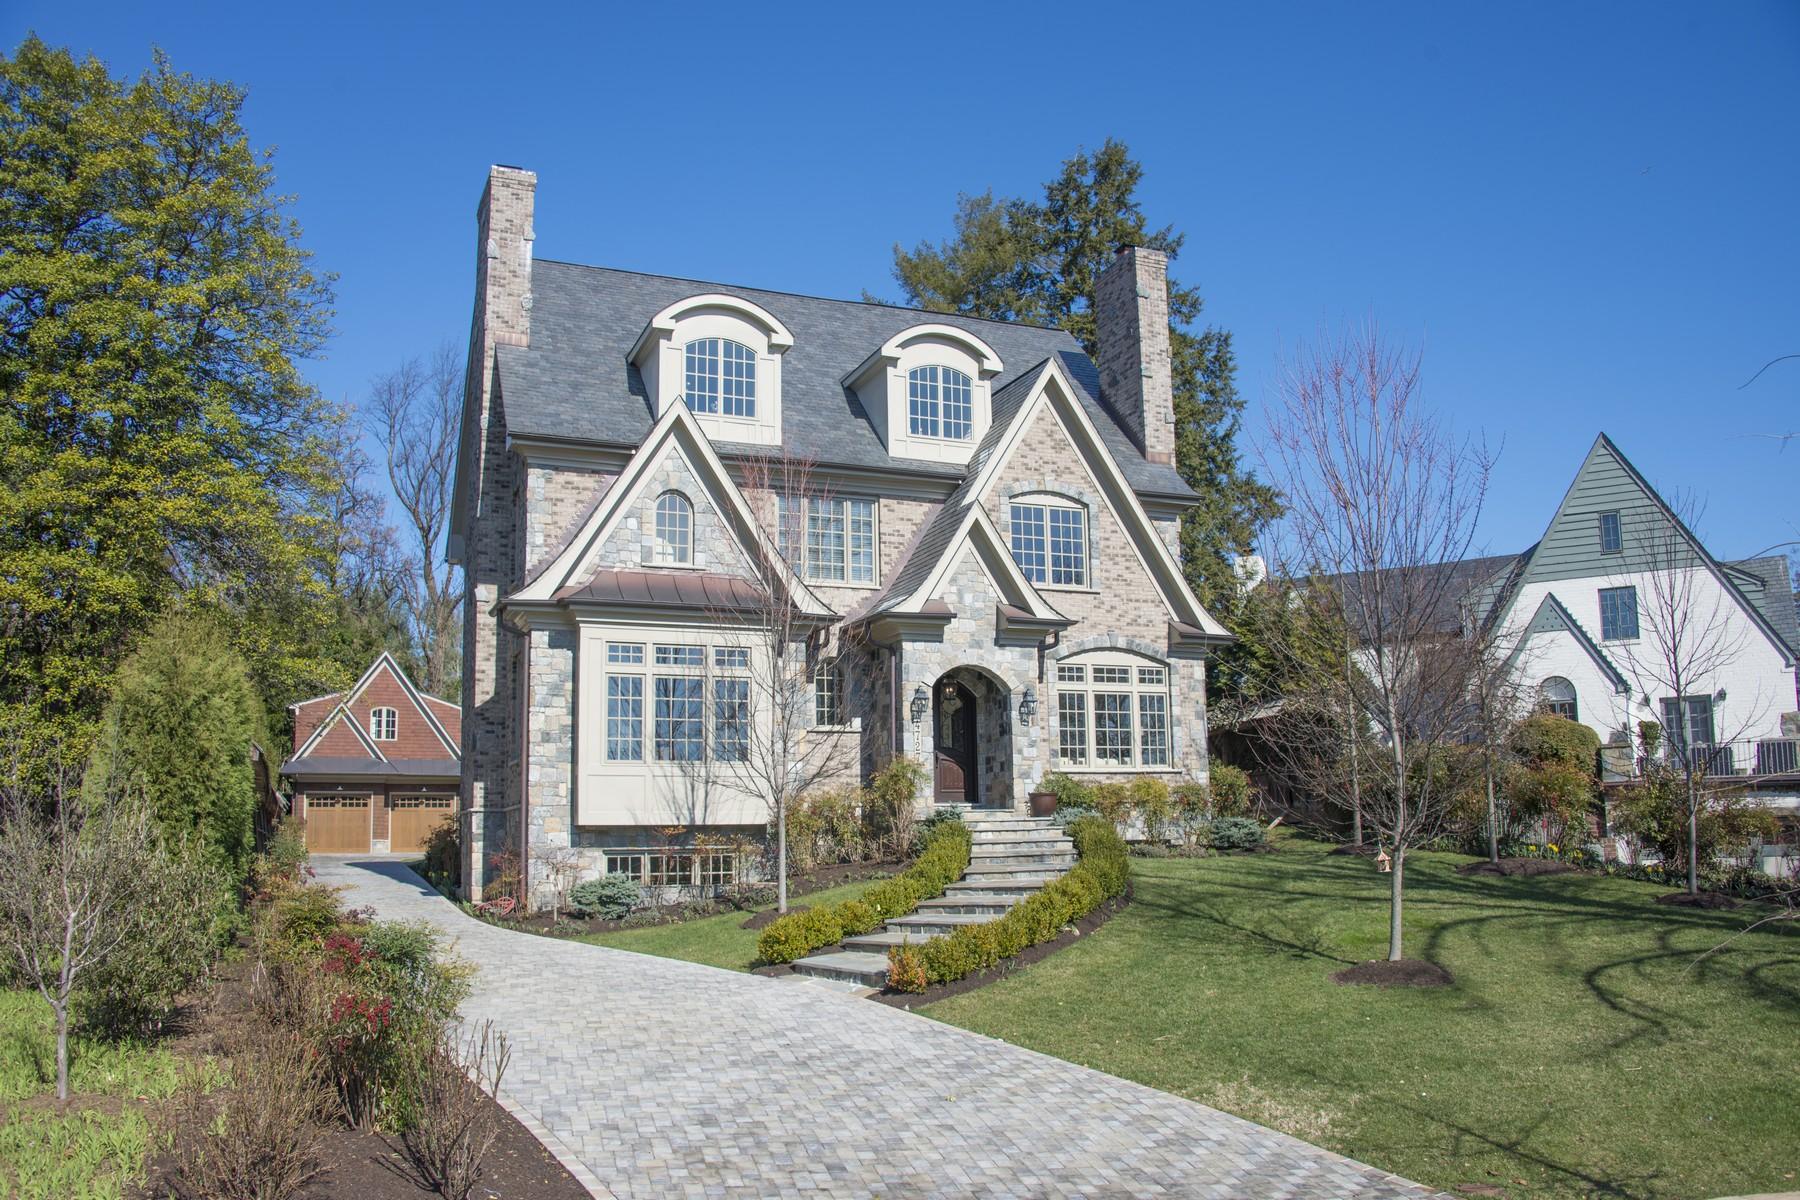 Villa per Vendita alle ore 4727 32nd Street N, Arlington Arlington, Virginia 22207 Stati Uniti